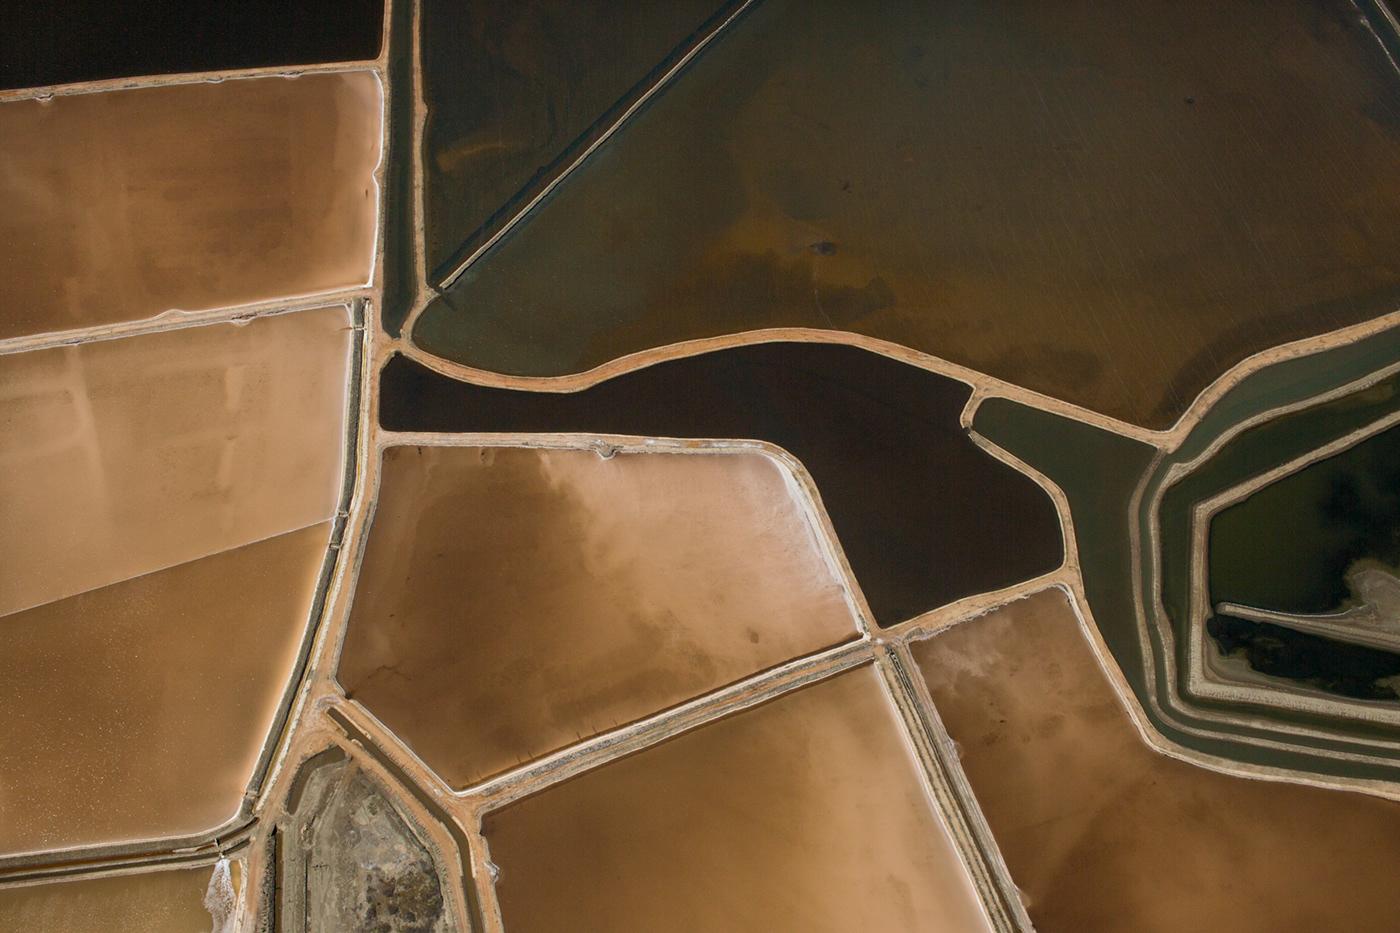 SEA CLOSED MAR DEFESO Renato Stockler Aerial Photography Brazillian photography Salt Salt farm